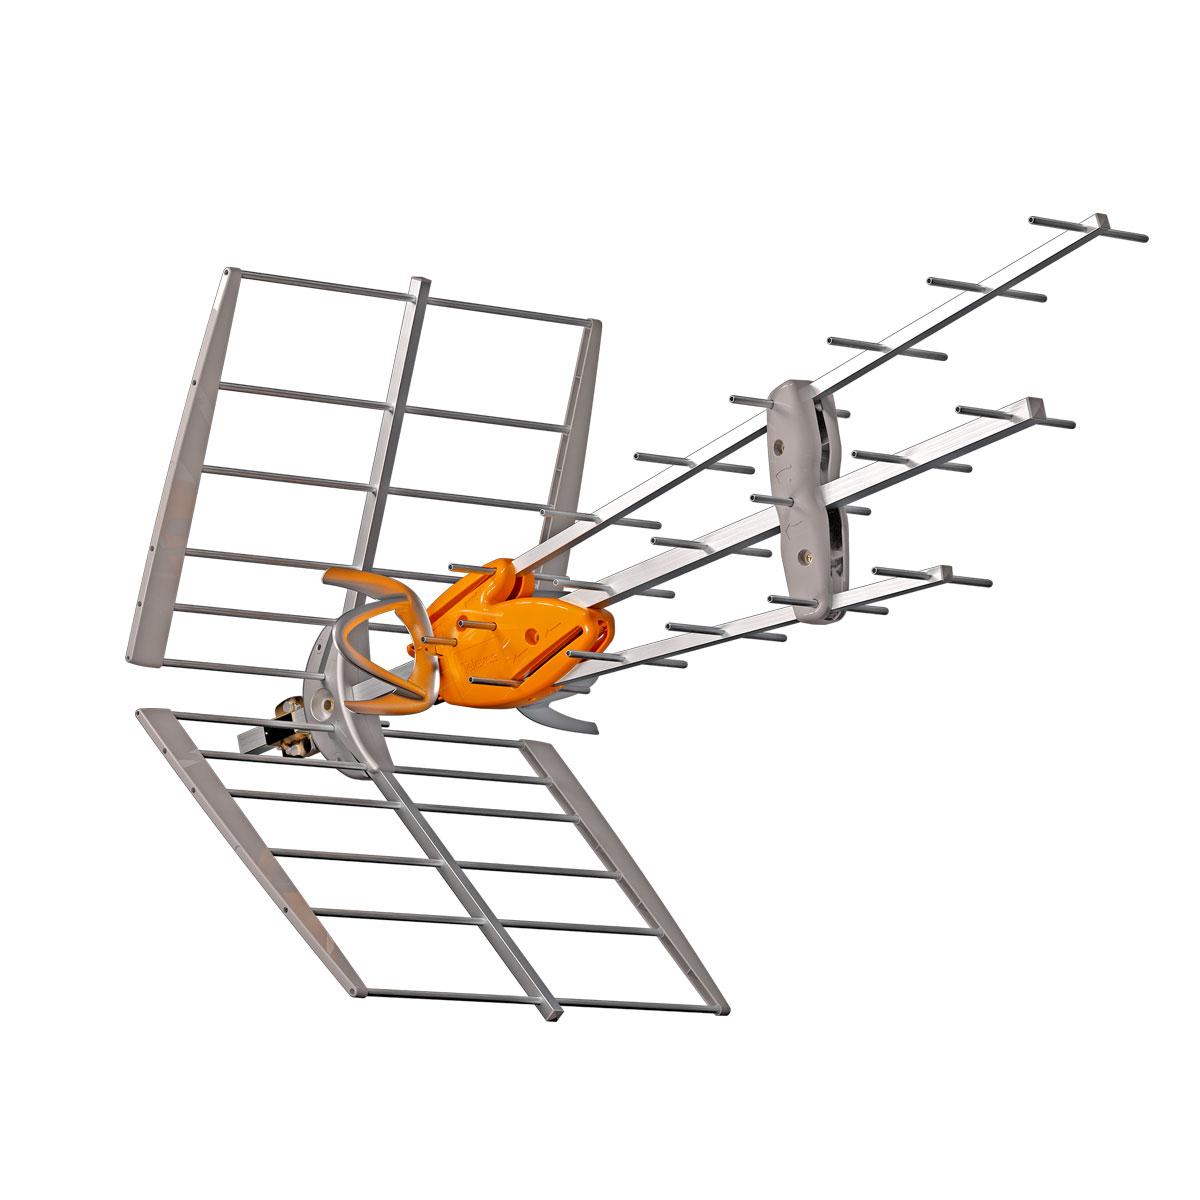 ANTENA DAT BOSS UHF G45 con directores asimétricos